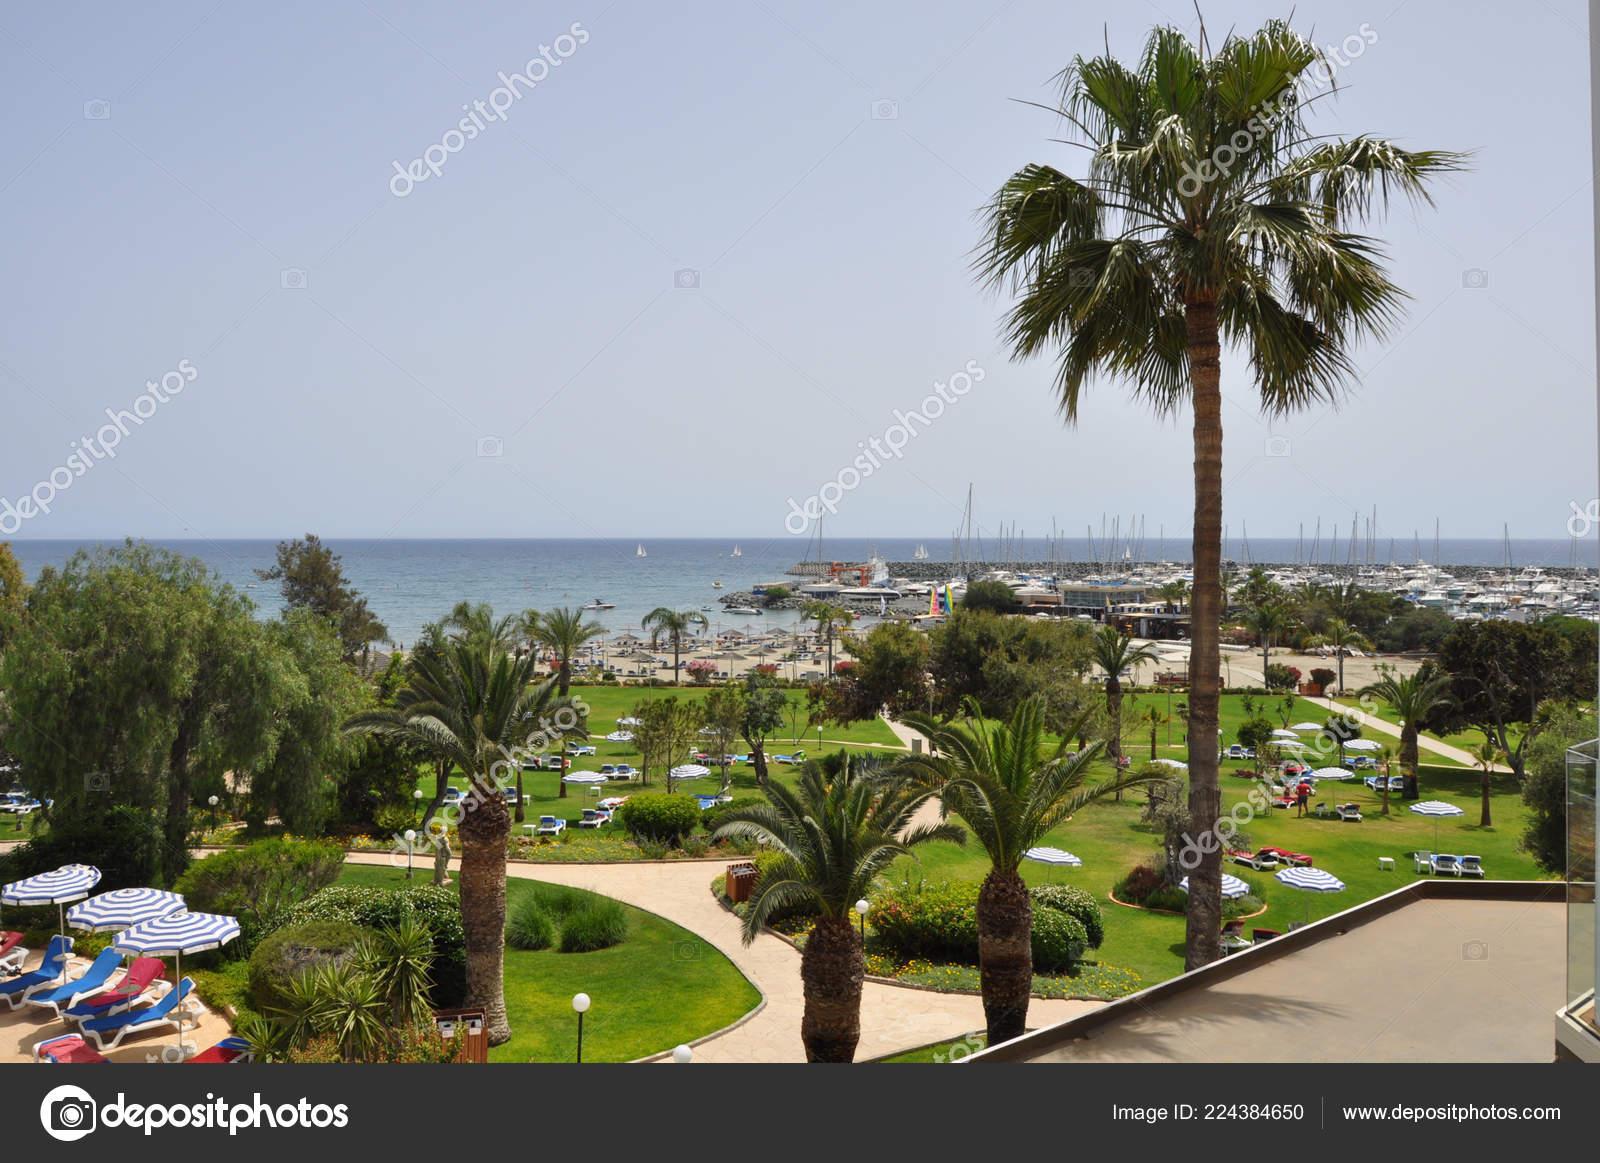 Beautiful Raphael Resort Hotel Building Limassol Cyprus — Stock Photo ©  maristos #224384650